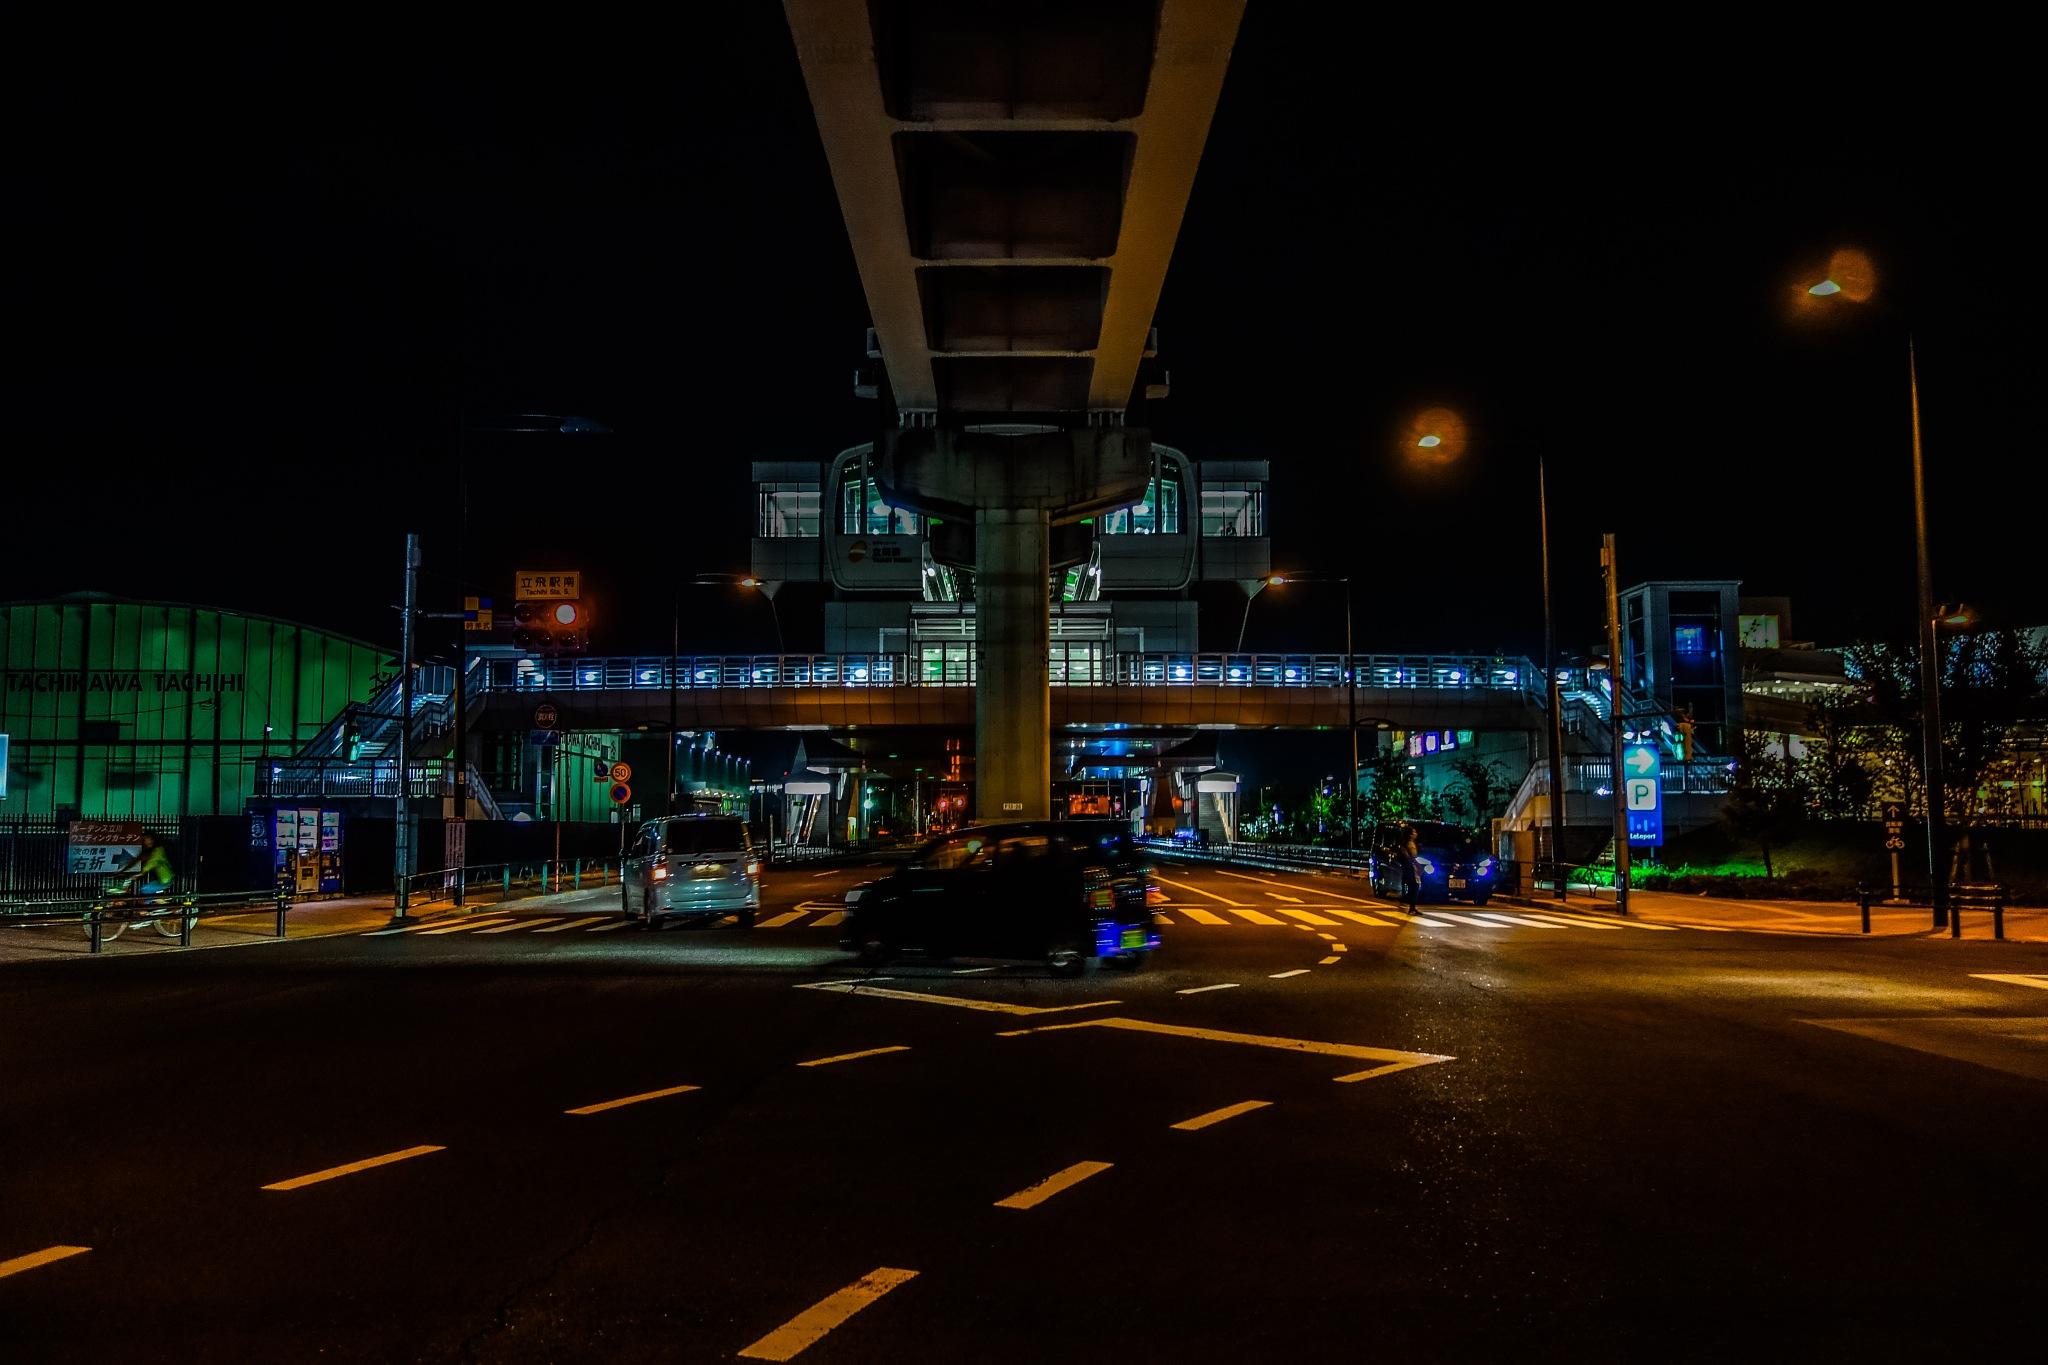 Tachihi Station Tokyo Japan by GooGoo